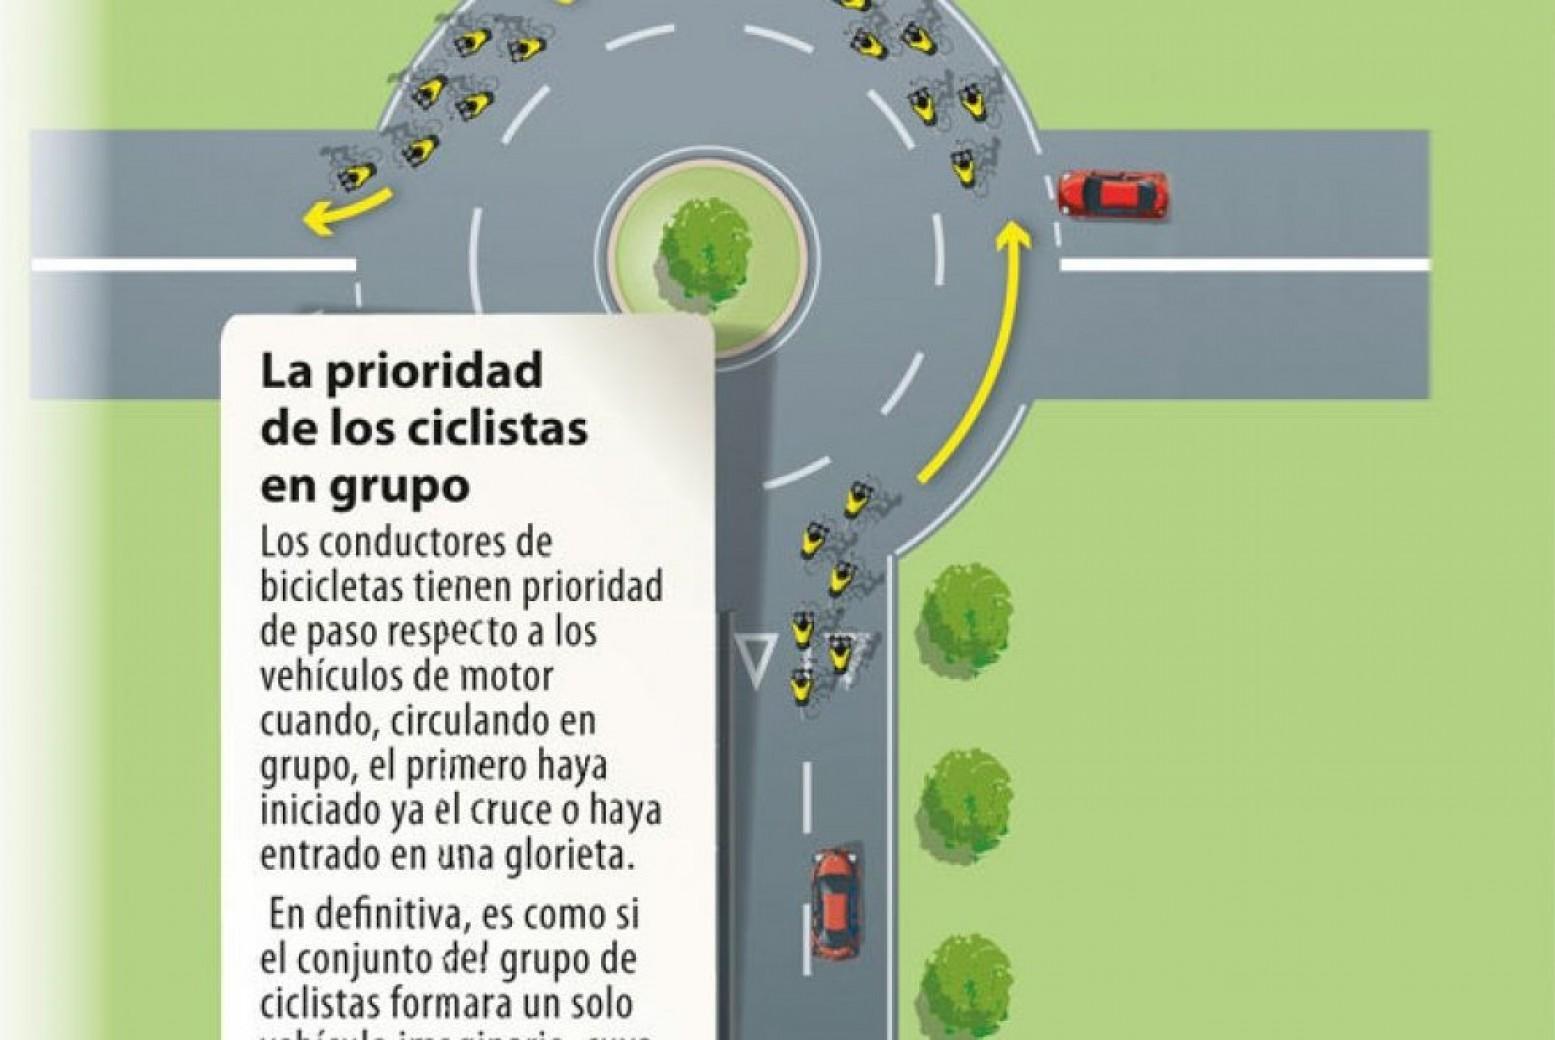 ciclistas-rotondas-prioridad/